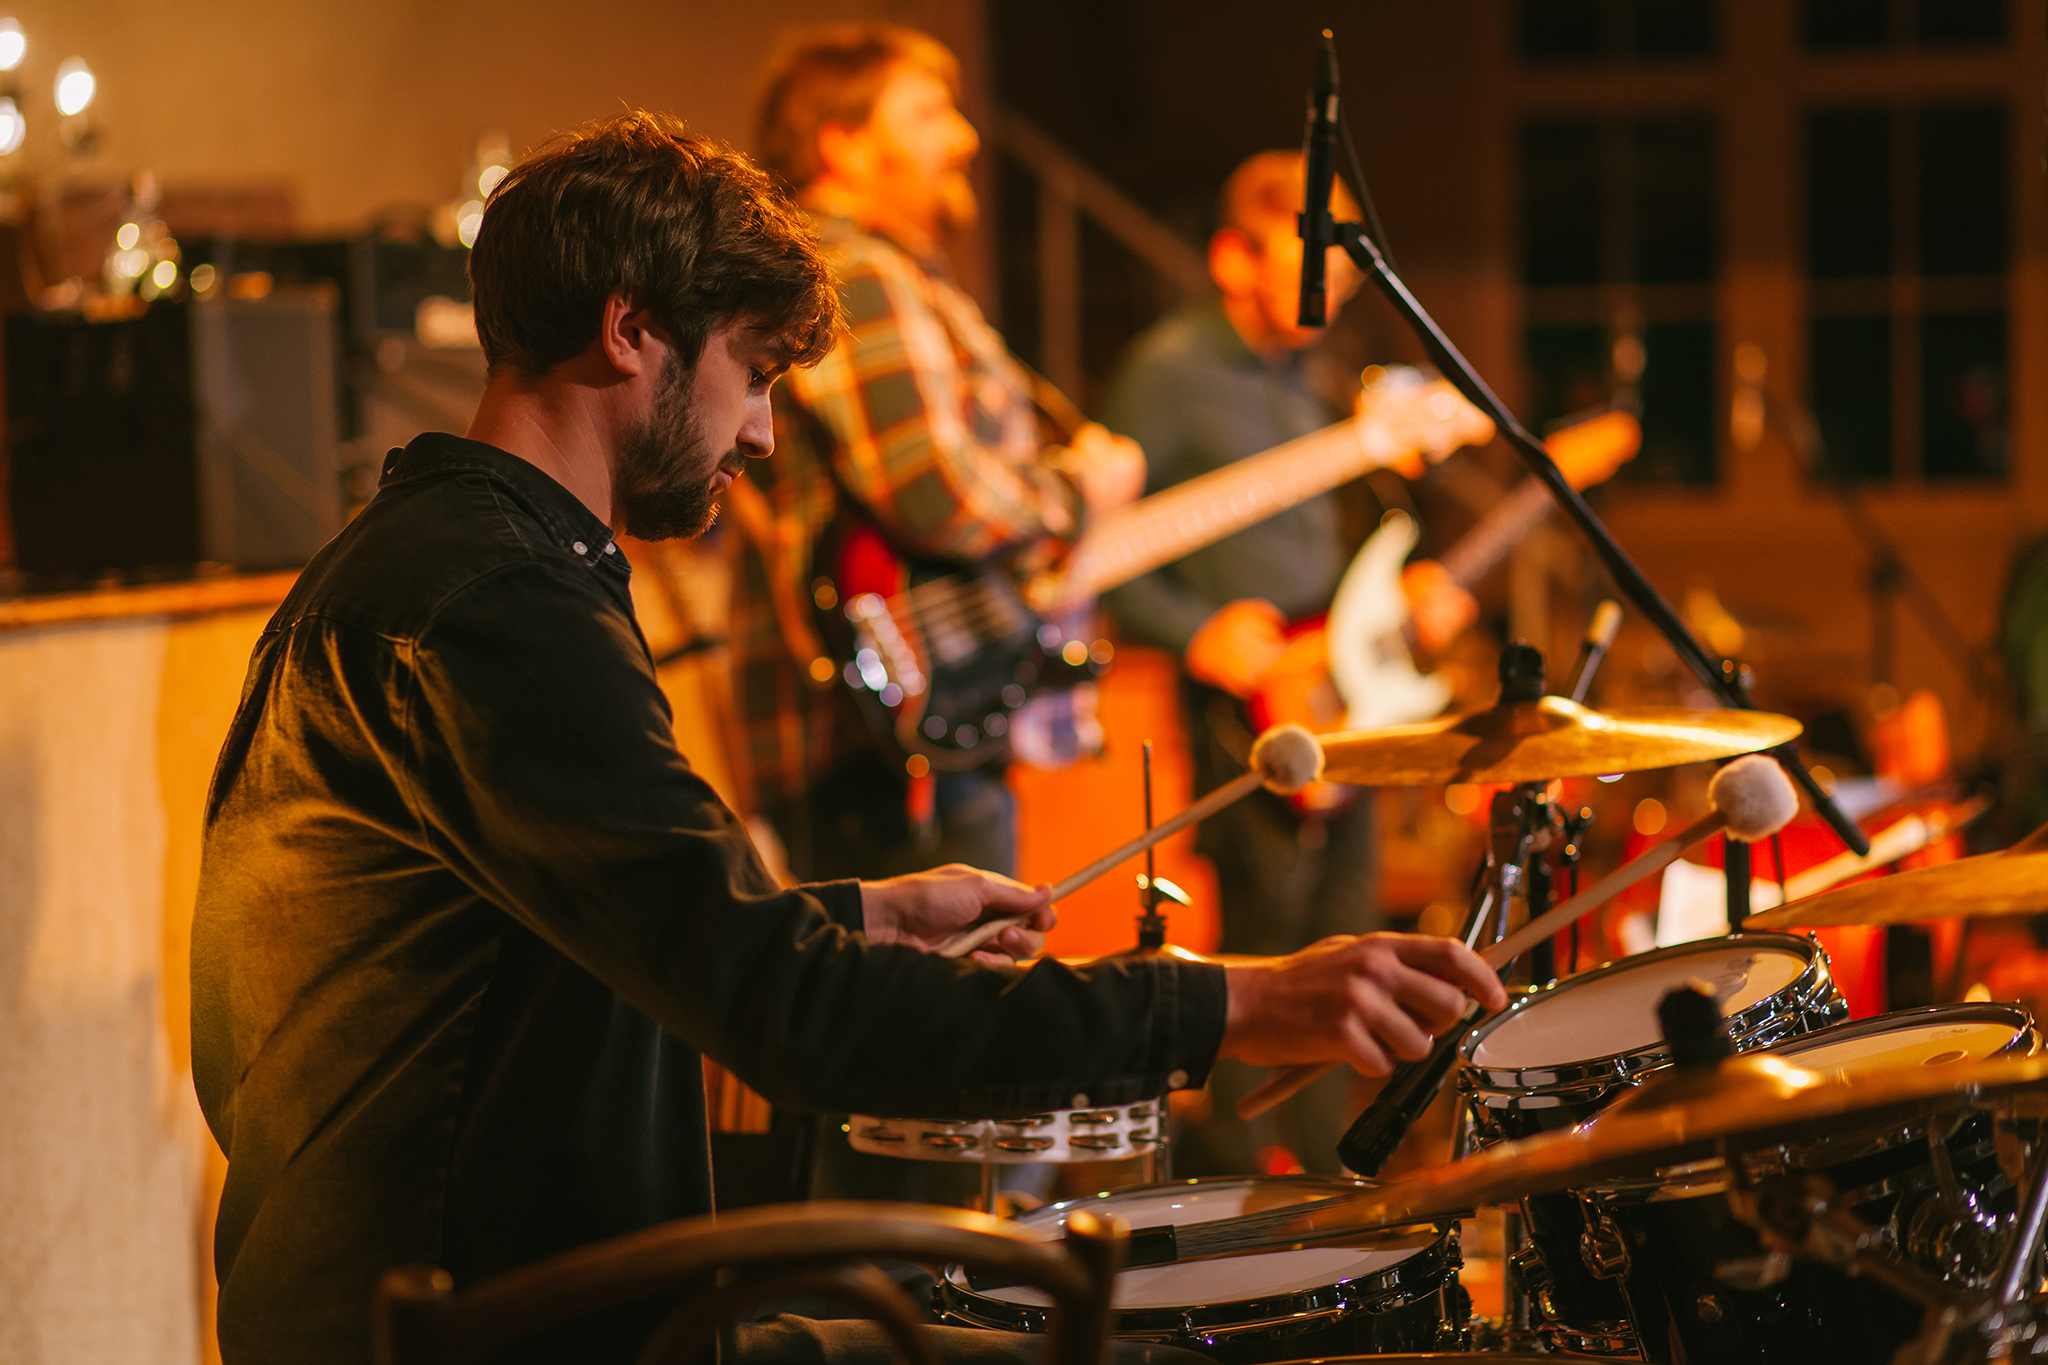 Eben-Ezer-Sessions am 18.10.2019: Marc Burger spielt Schlagzeug. (Foto: Knut Burmeister, ALLTAG)